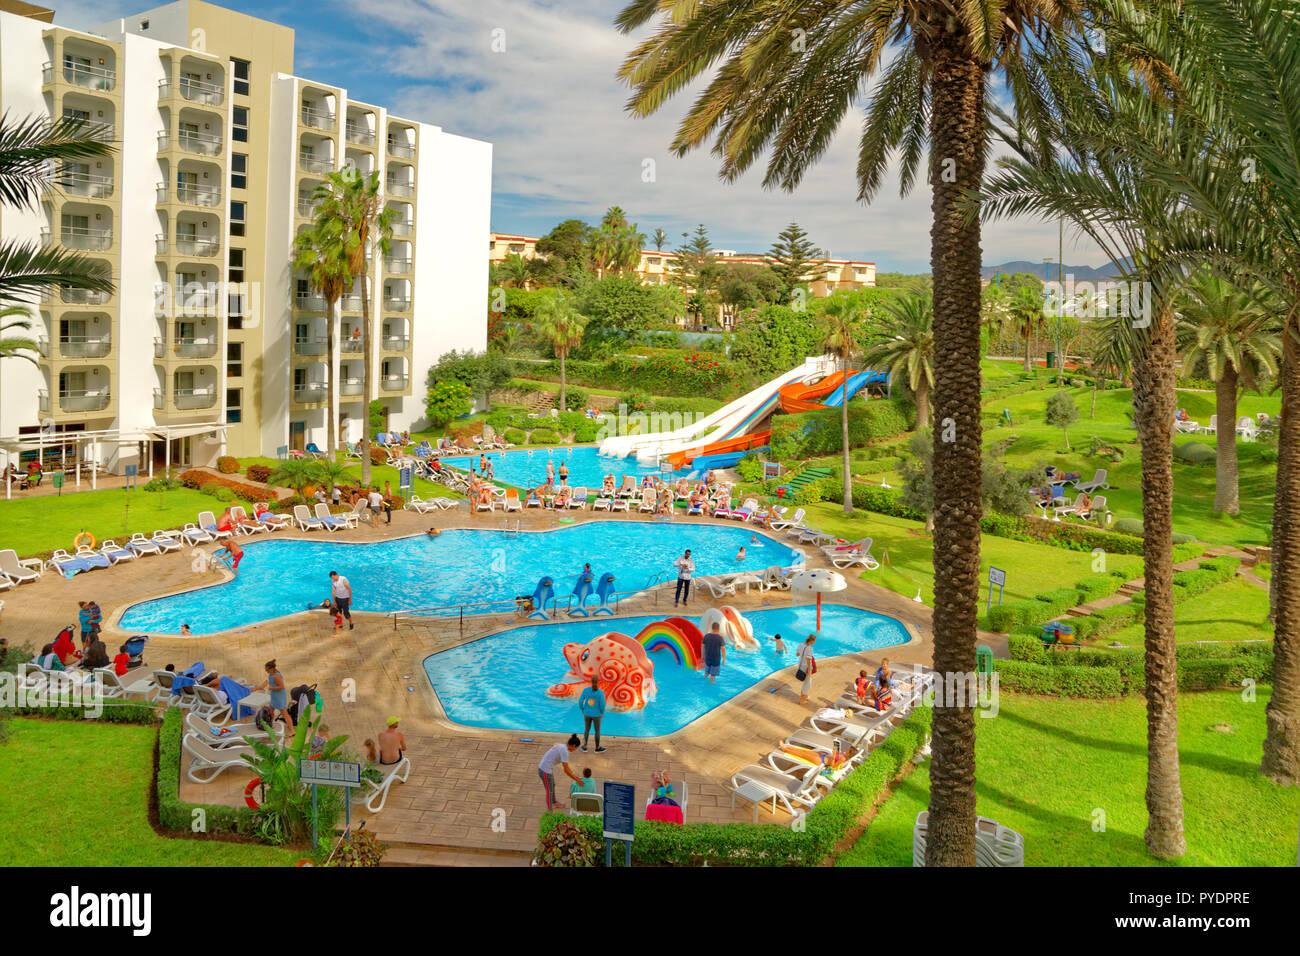 The Kenzi Europa Hotel at Agadir in Morocco, Northwest Africa. - Stock Image